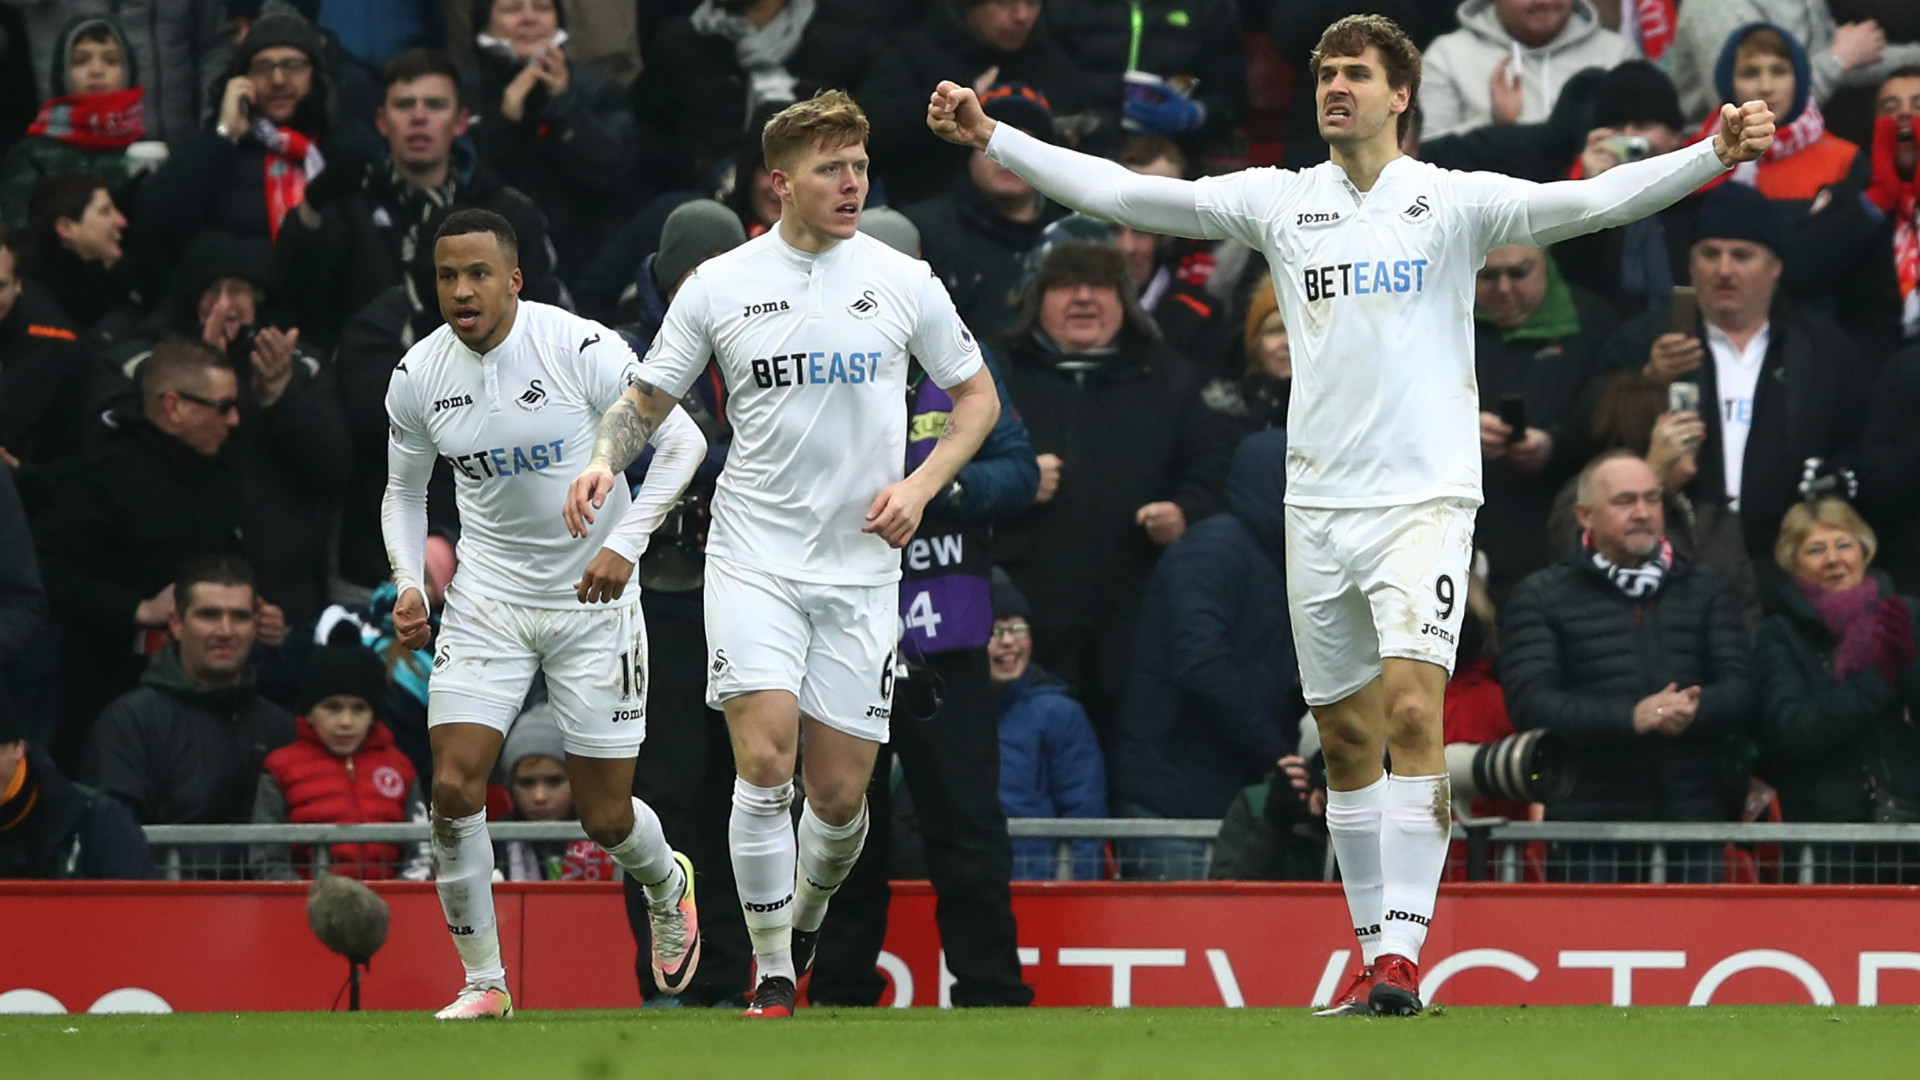 HD Swansea celebrate v LFC